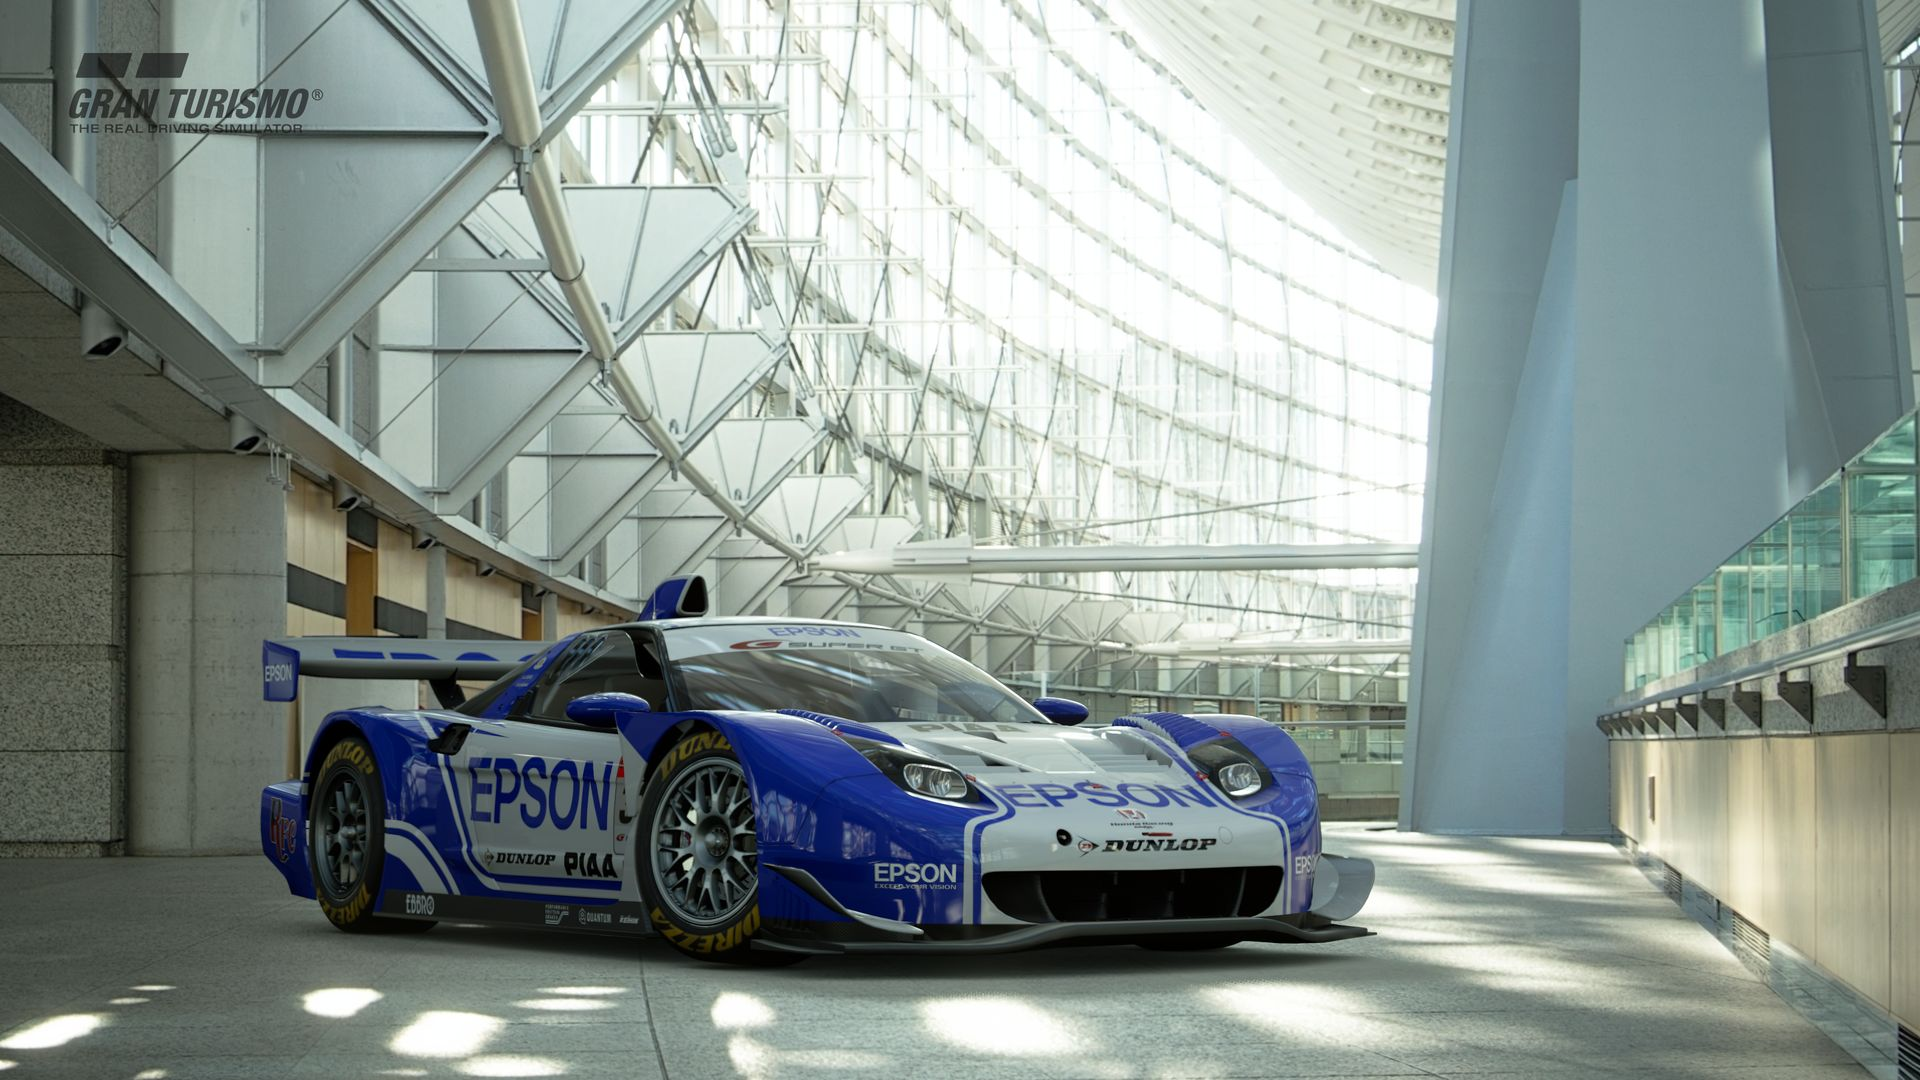 Gran Turismo Sport November Update Honda EPSON NSX '08 (Gr.2) 1